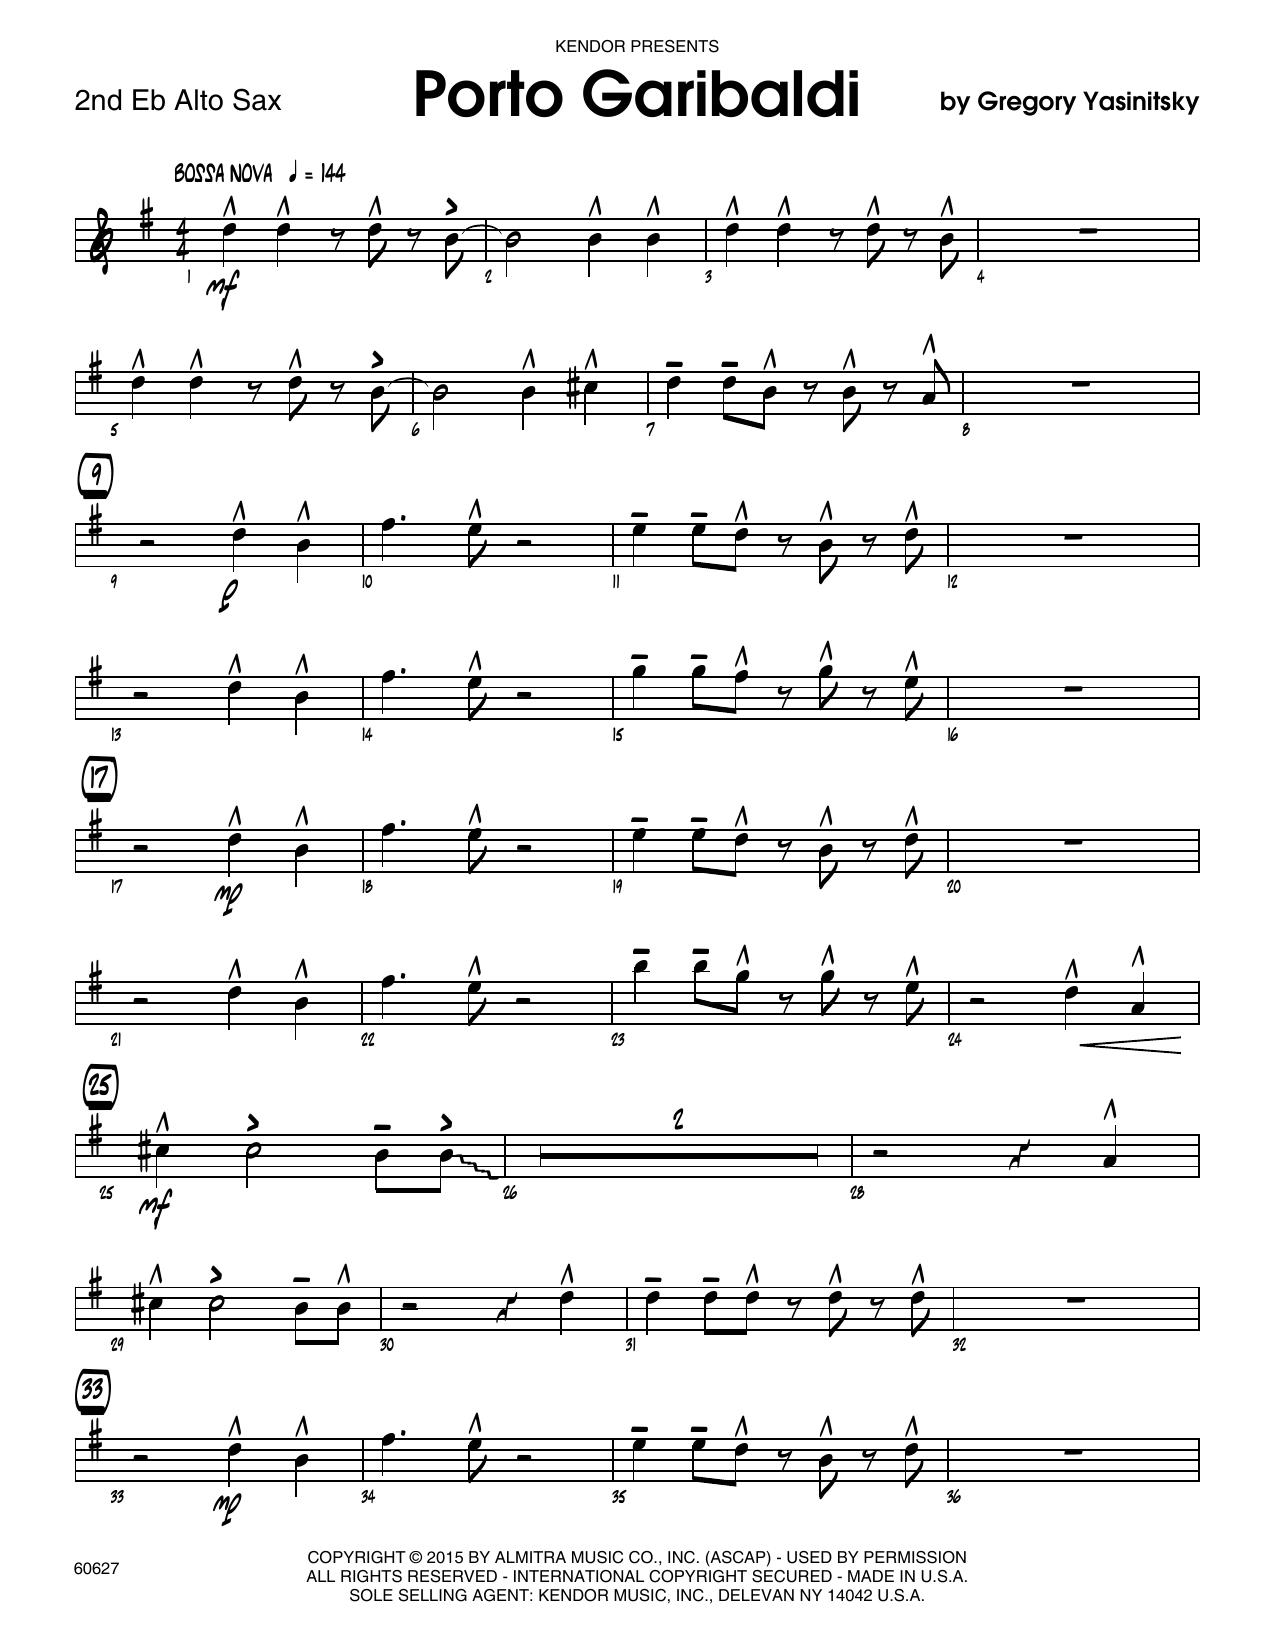 Porto Garibaldi - 2nd Eb Alto Saxophone Sheet Music